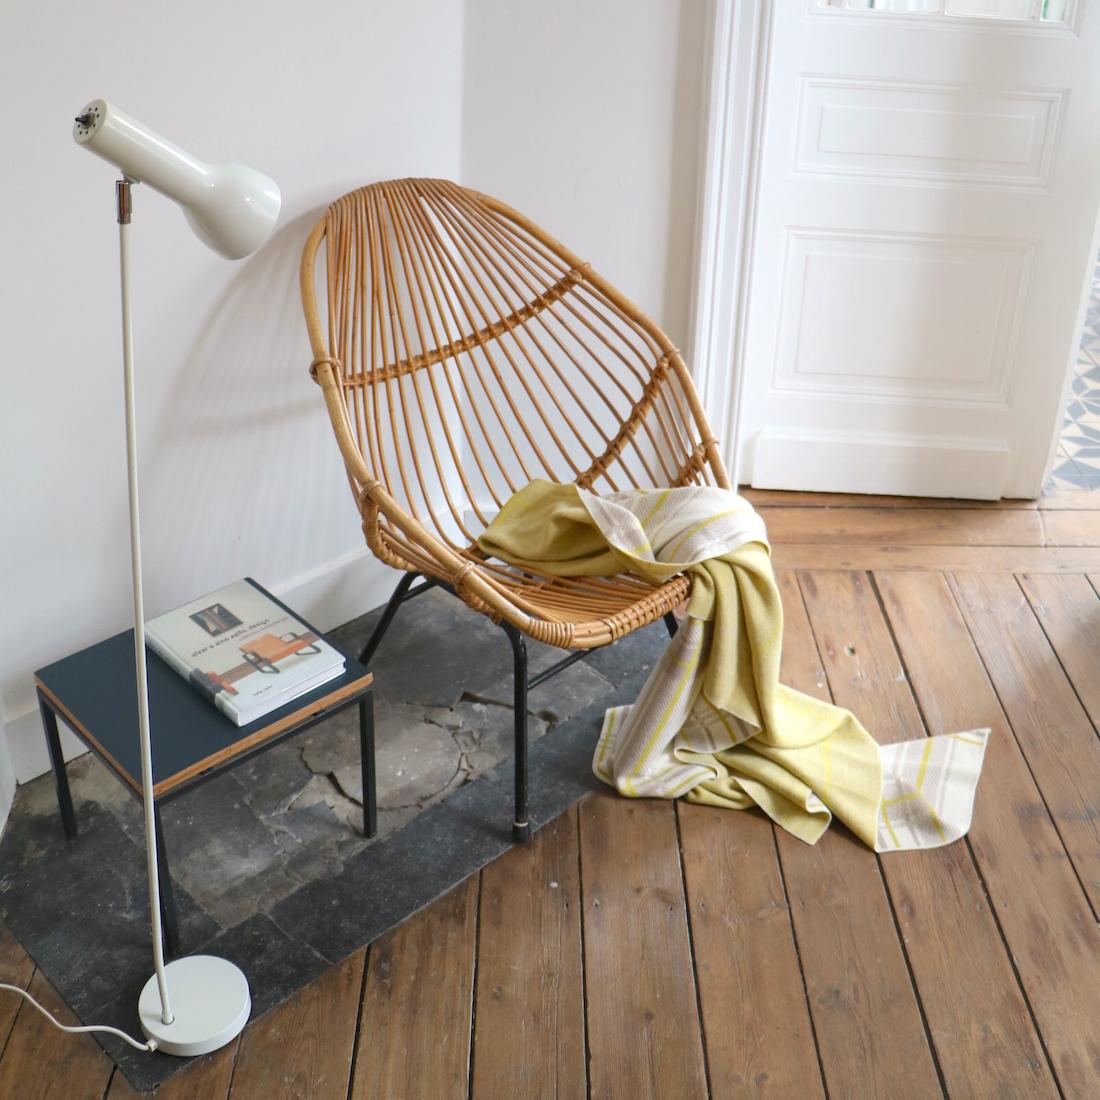 fauteuil en rotin hexagonal la maison bruxelloise. Black Bedroom Furniture Sets. Home Design Ideas